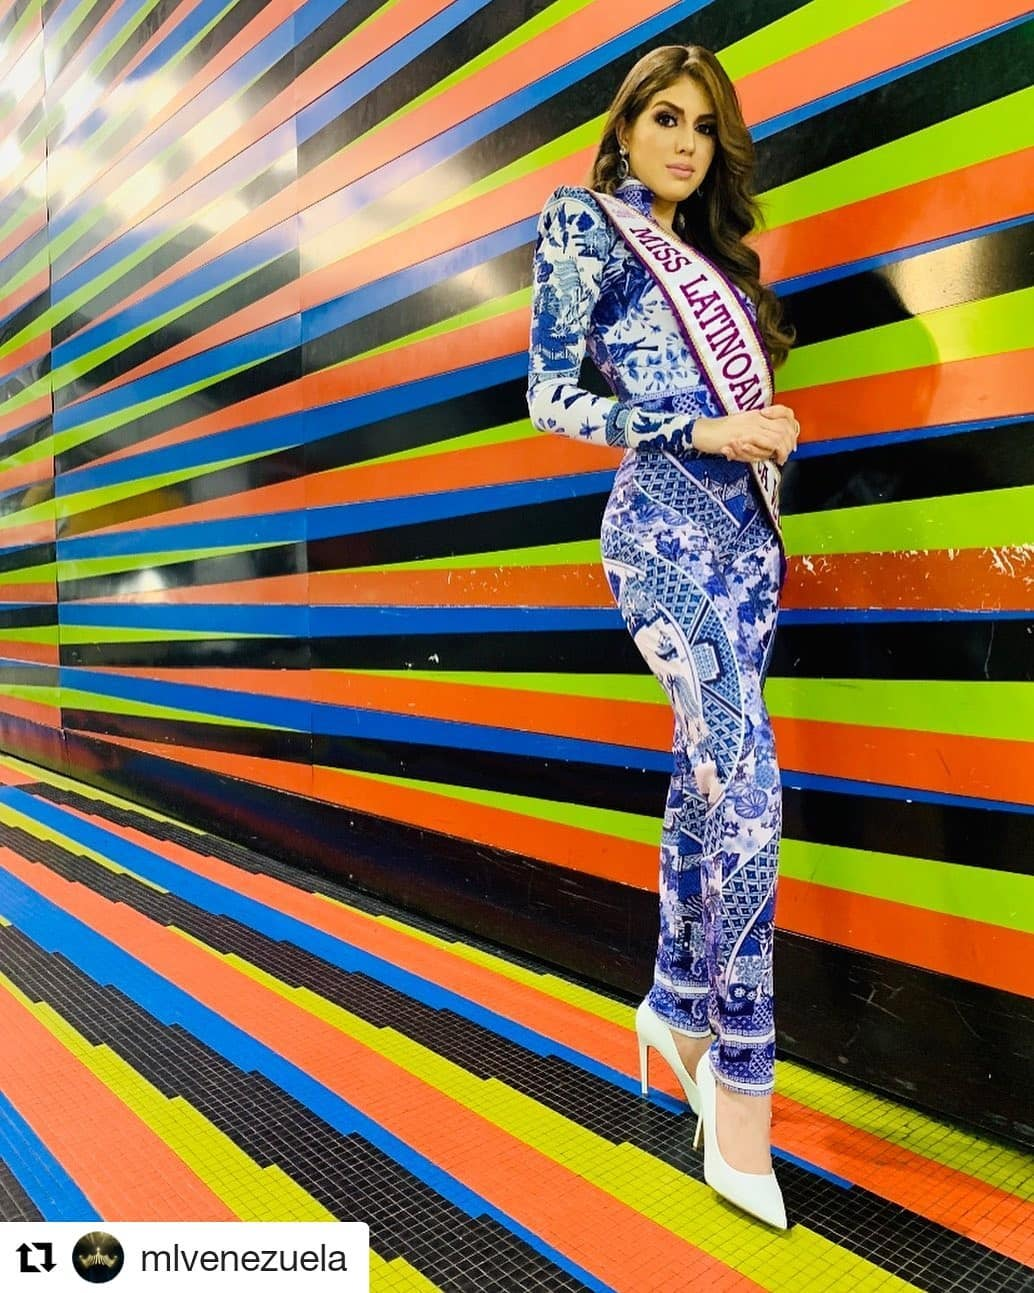 mariana galindez, 3ra finalista de miss latinoamerica 2019. - Página 2 68905110